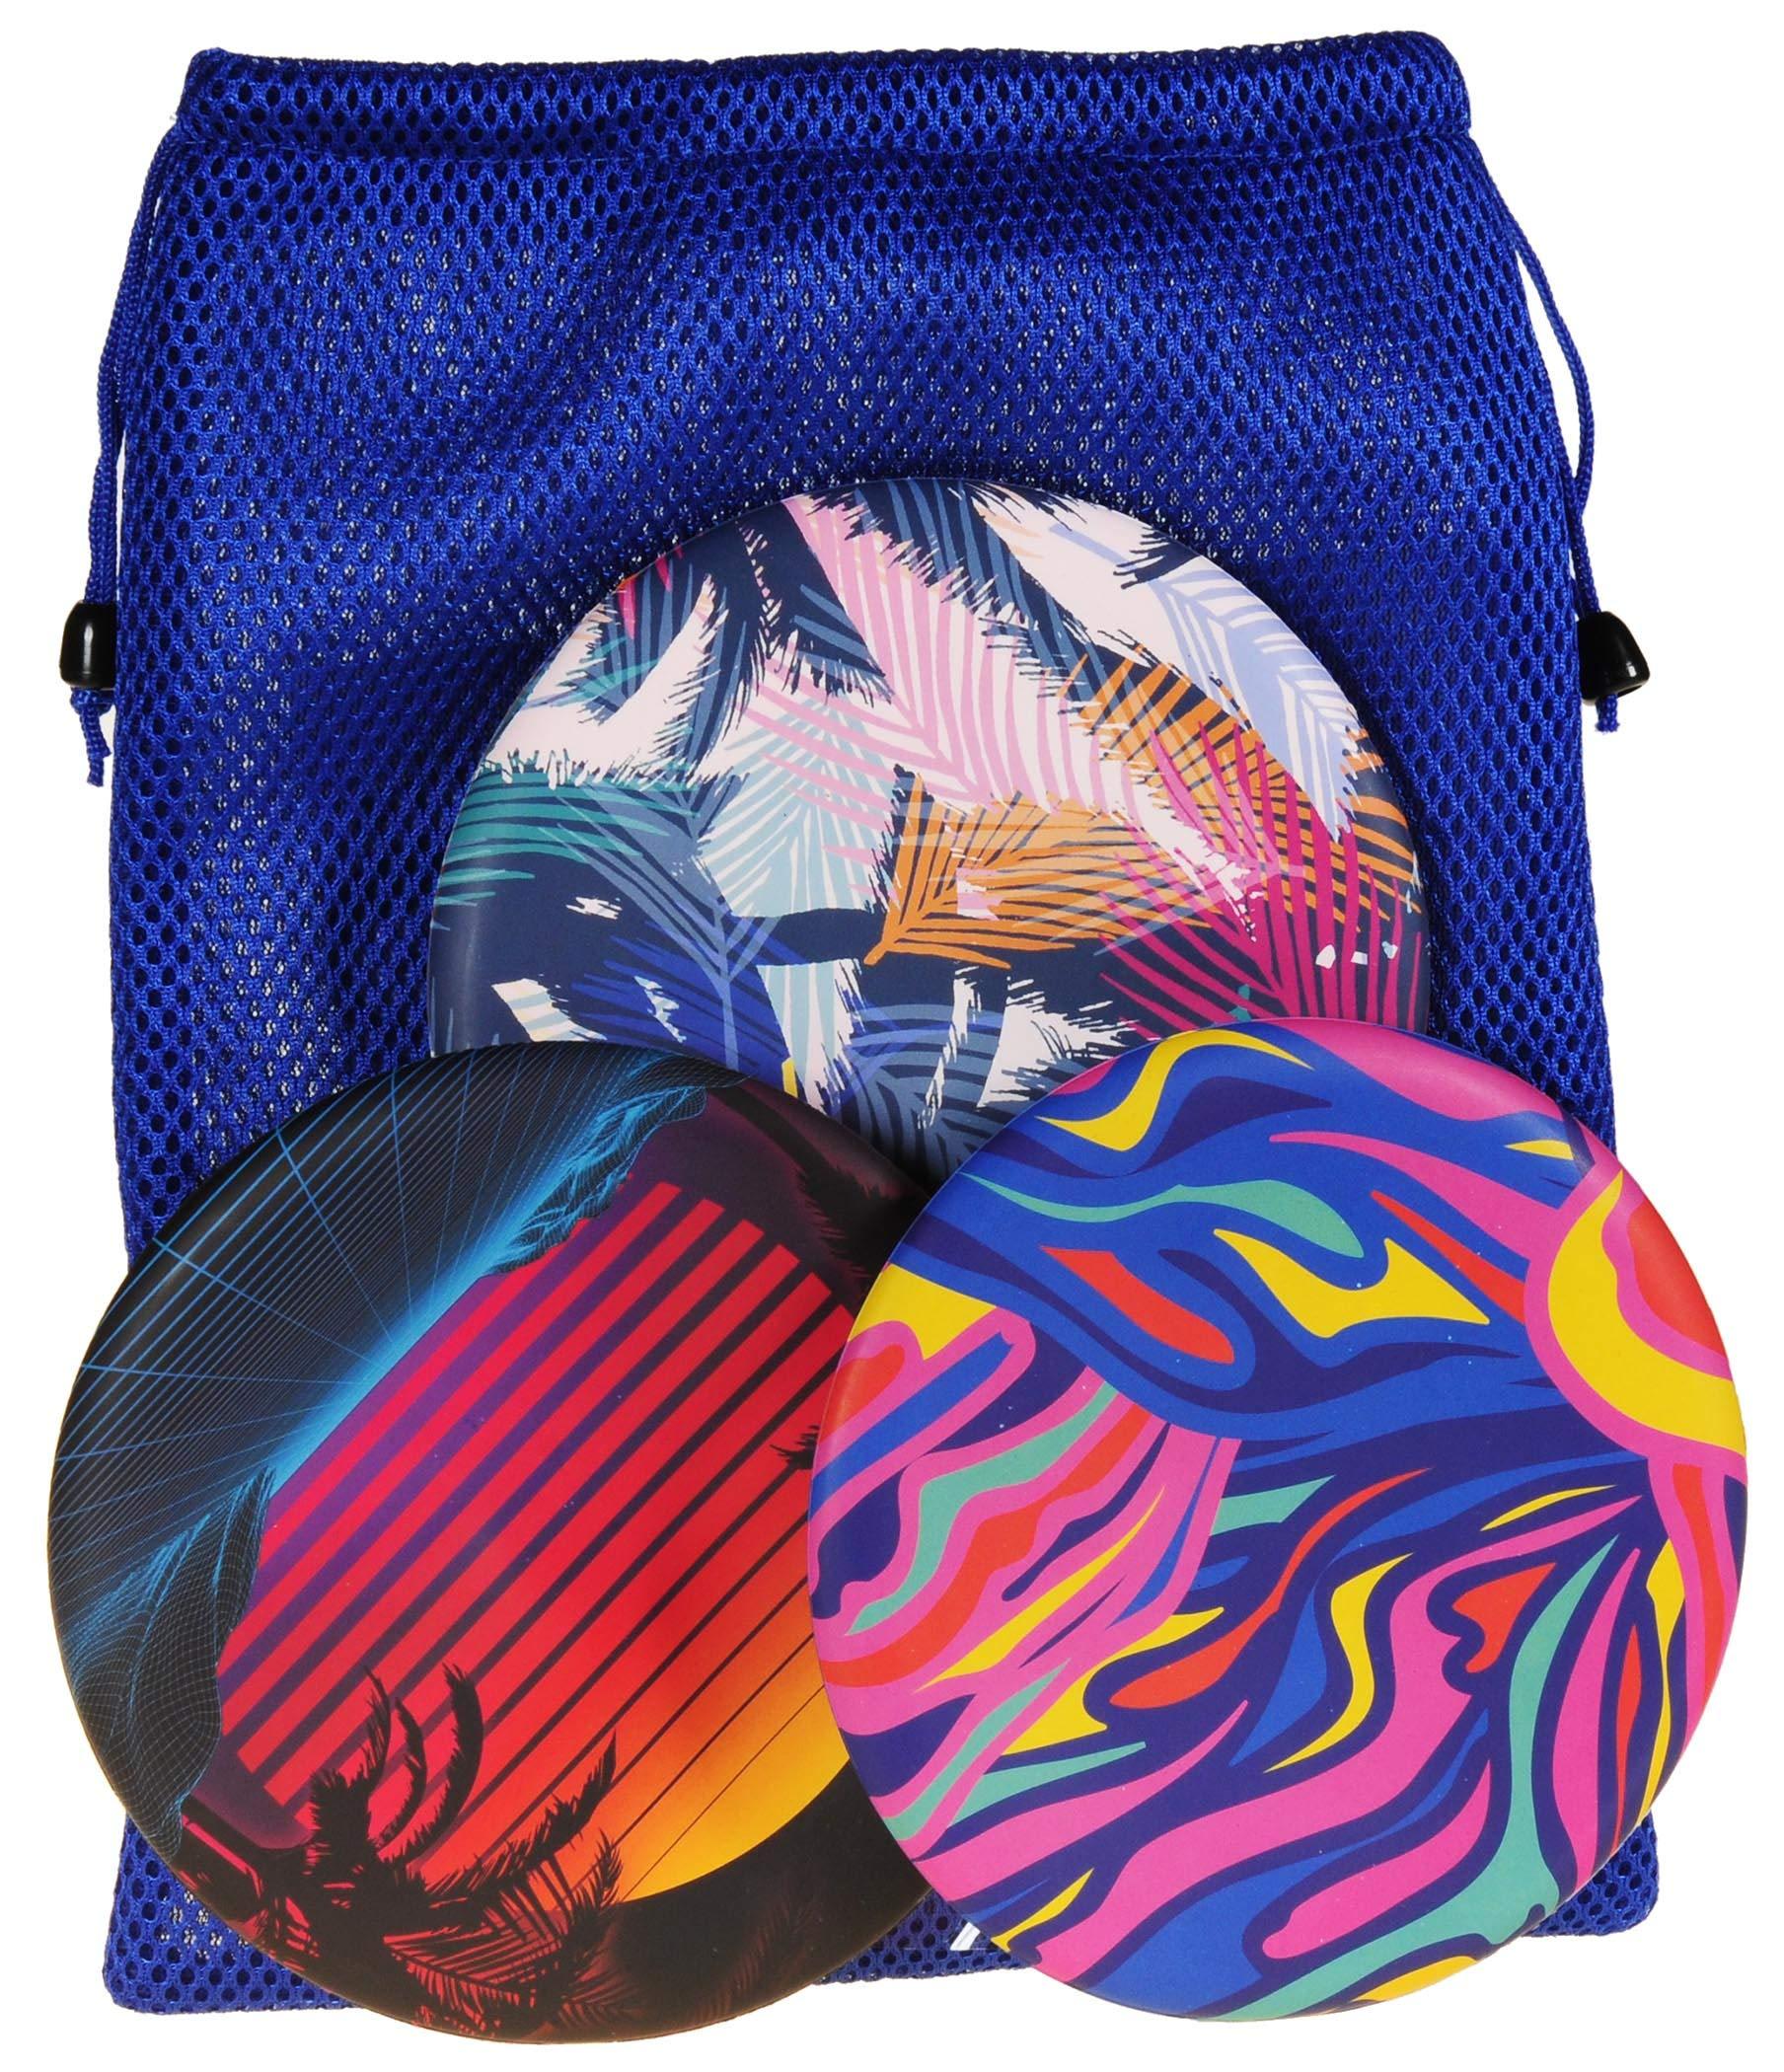 Waboba Wingman Flying Silicone Disc || Bundle of 3 Multi-Colors (SET1) || Bonus Blue Nylon Mesh Drawstring Carry Bag || Bundled Items by Waboba